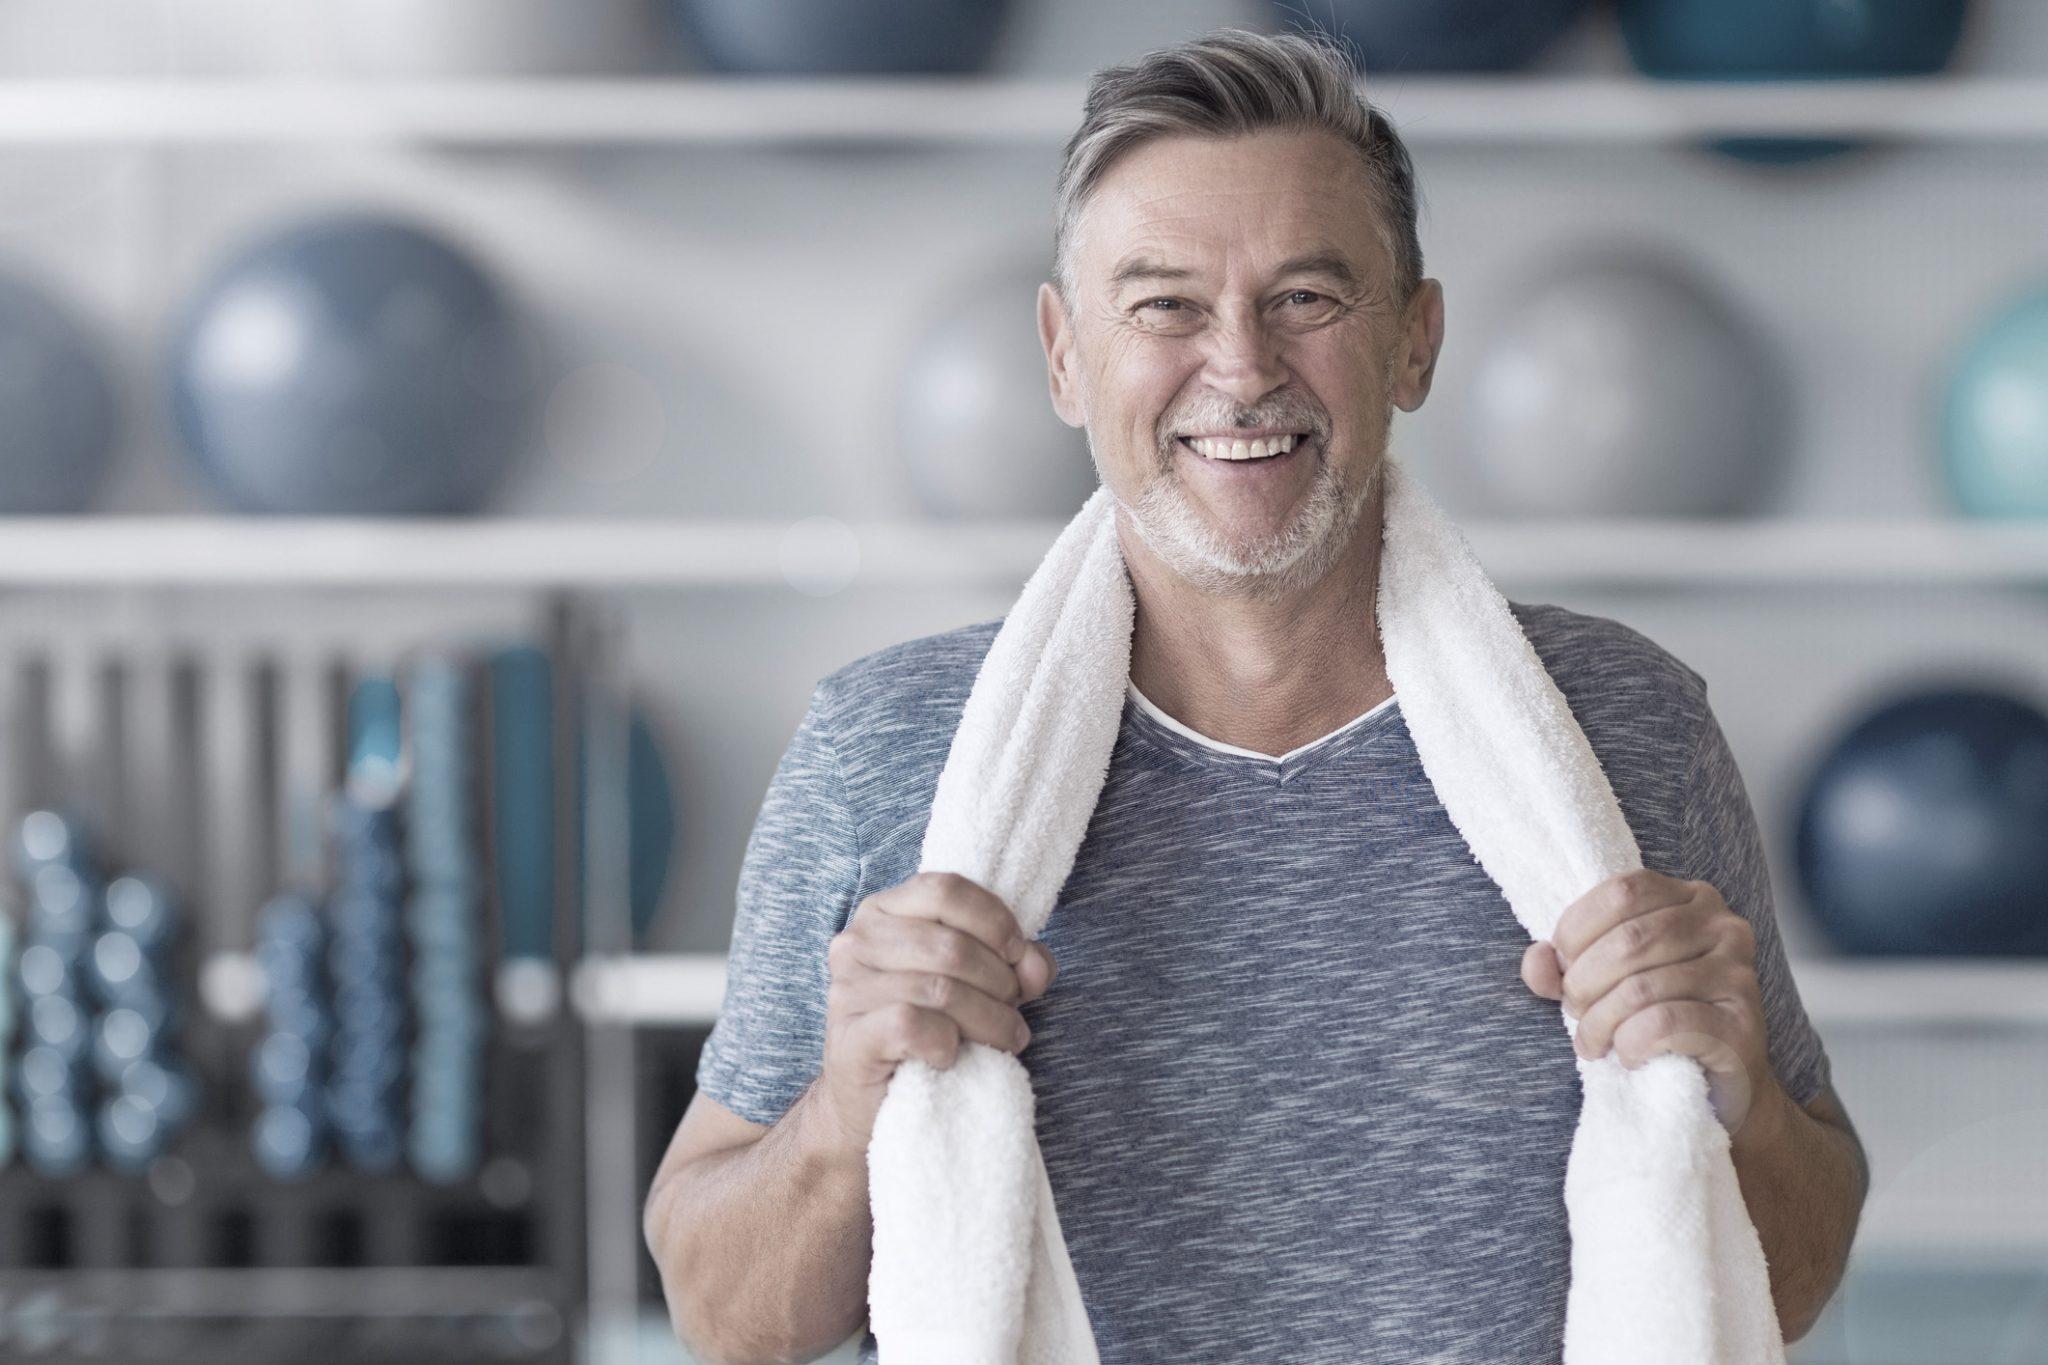 Muévete para prevenir la atrofia muscular